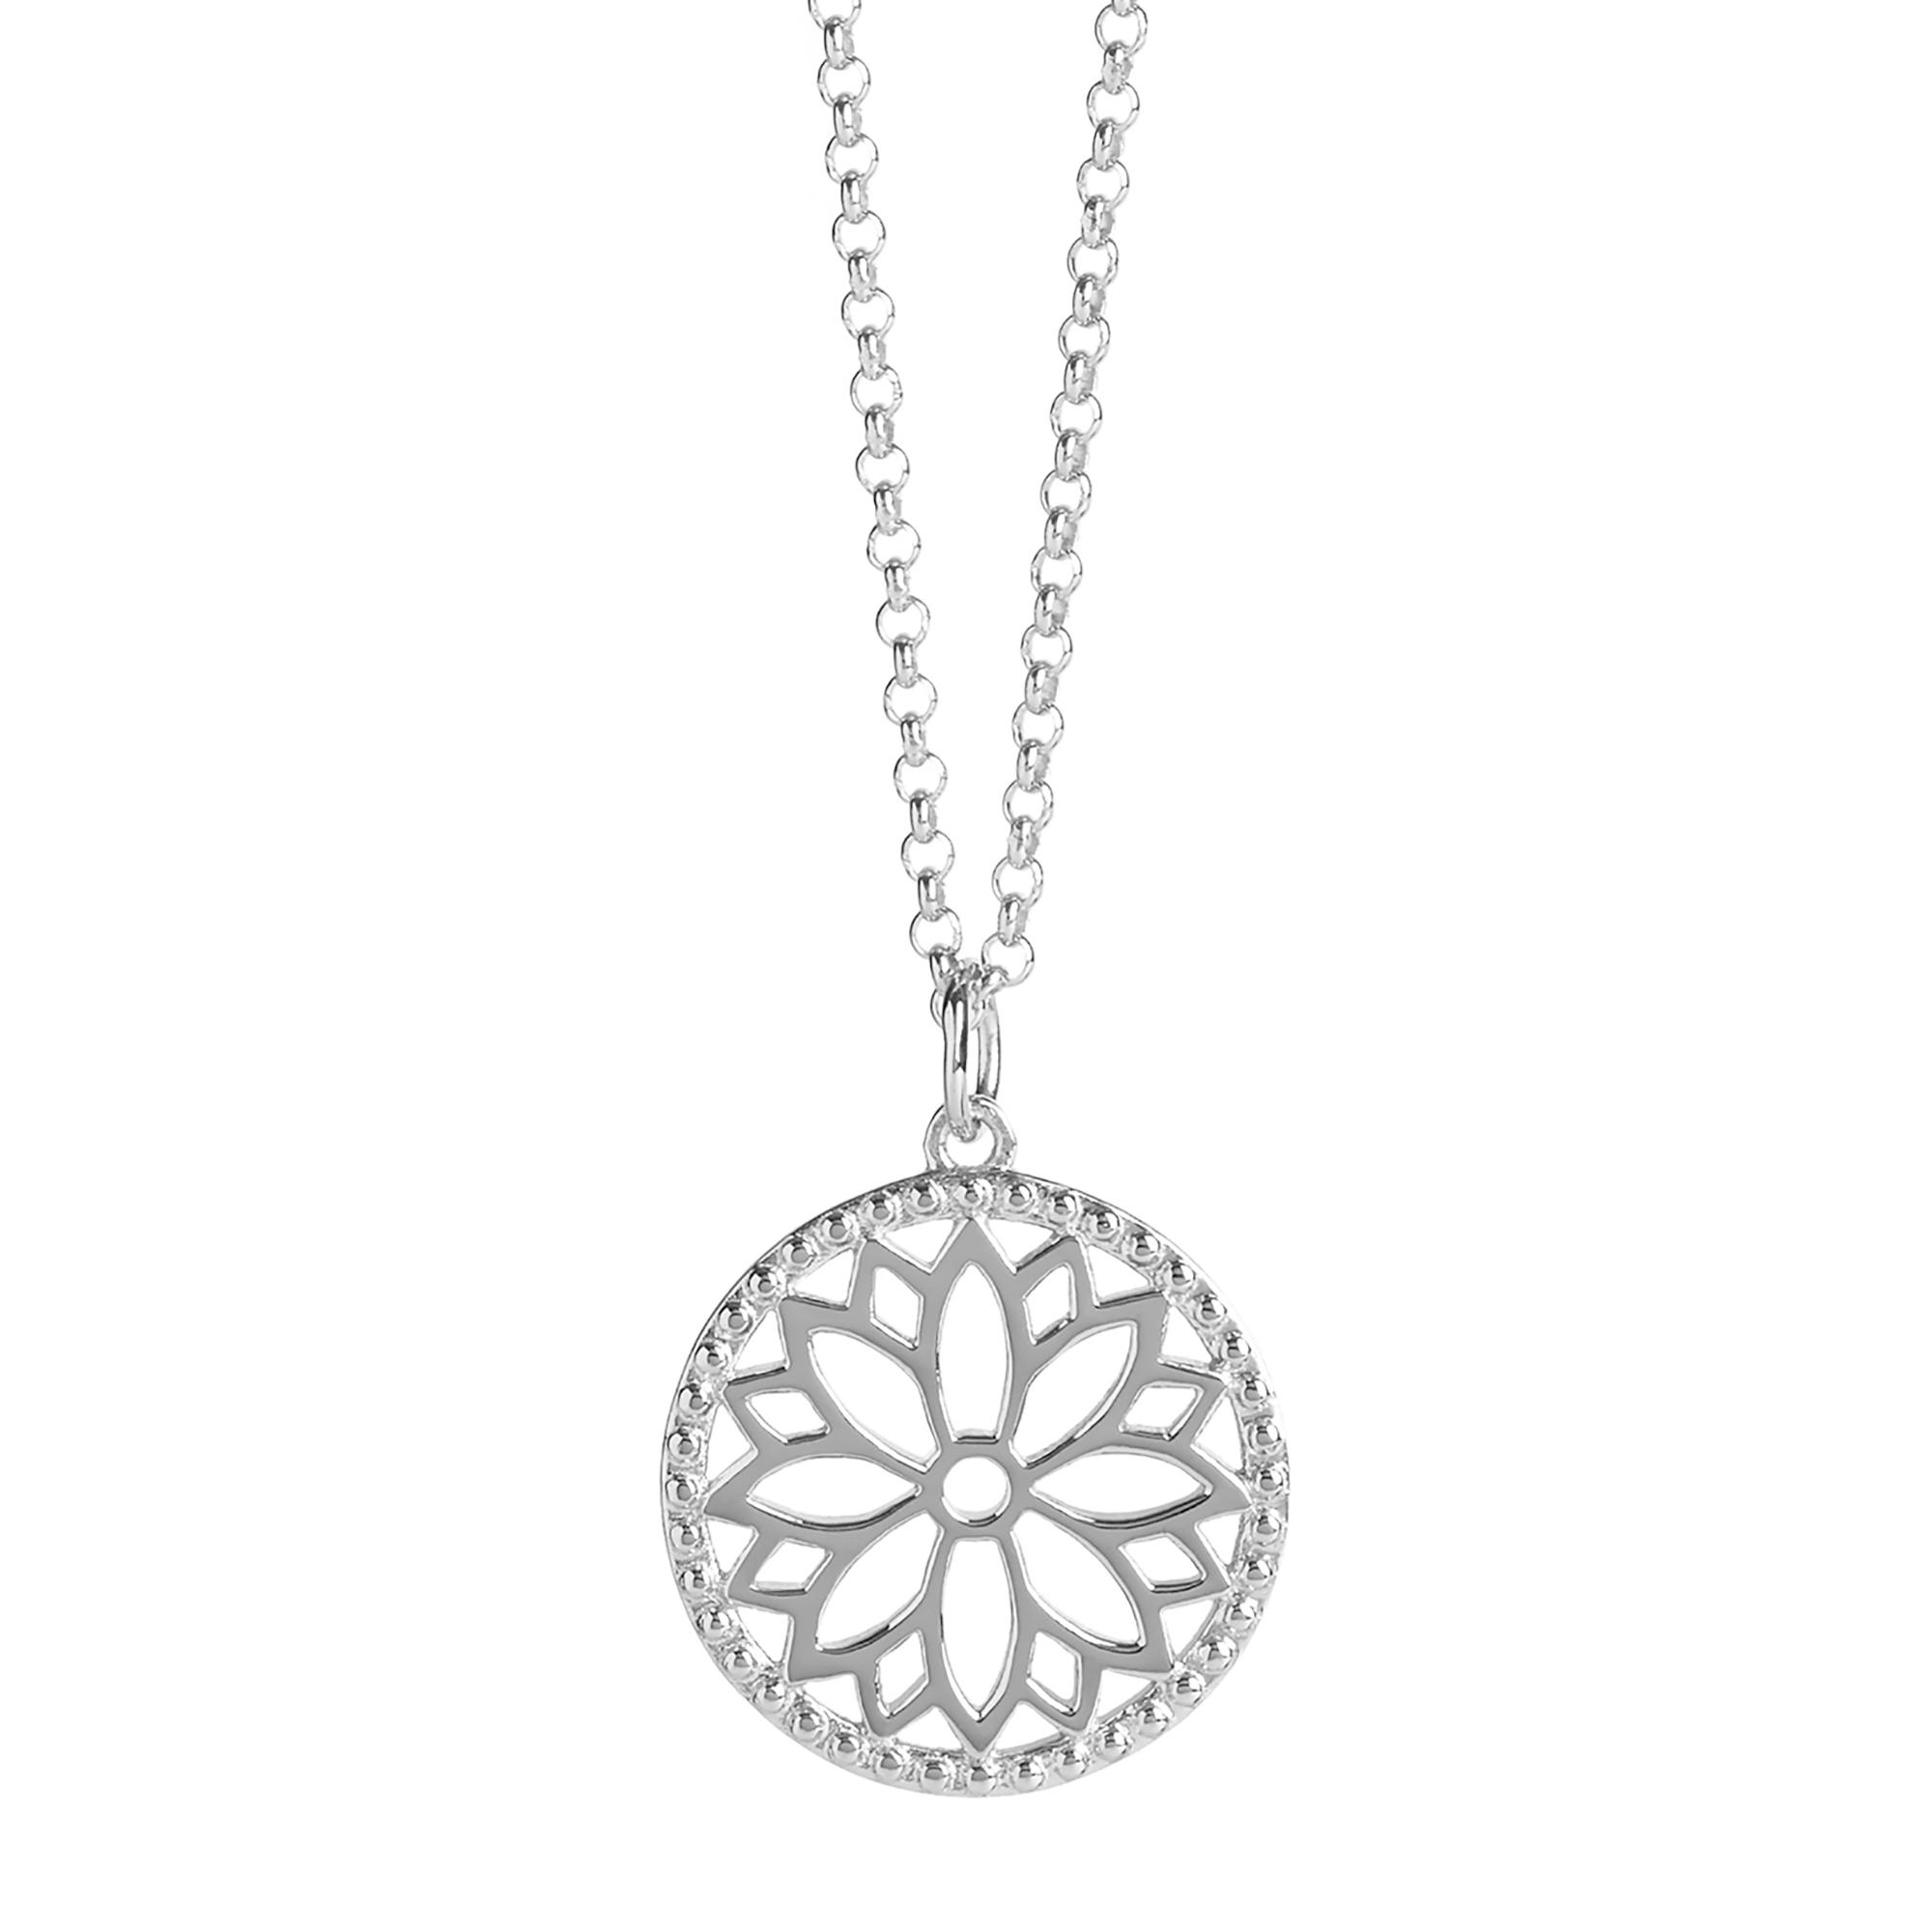 Muru Purity Mandala Charm Necklace Silver